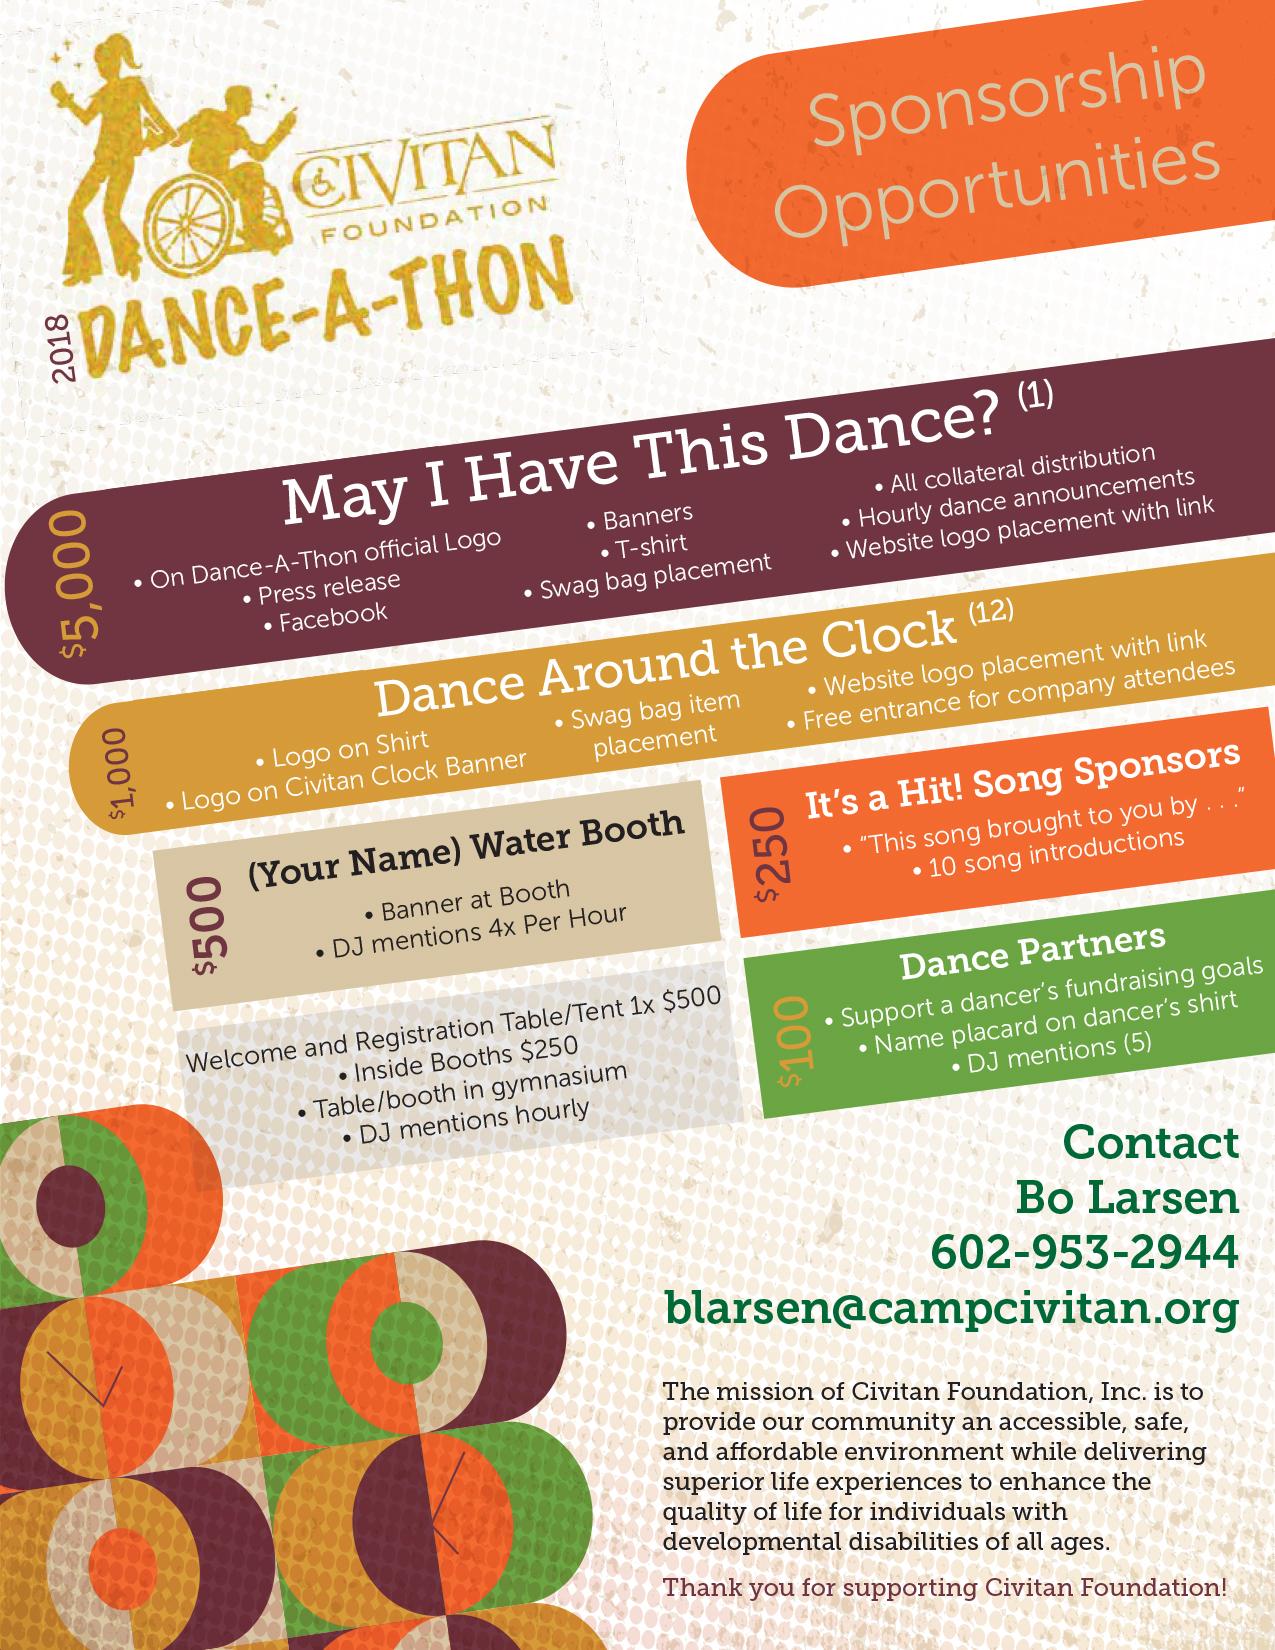 2018-Dance-a-thon-Sponsors-Flyer-DIGITAL